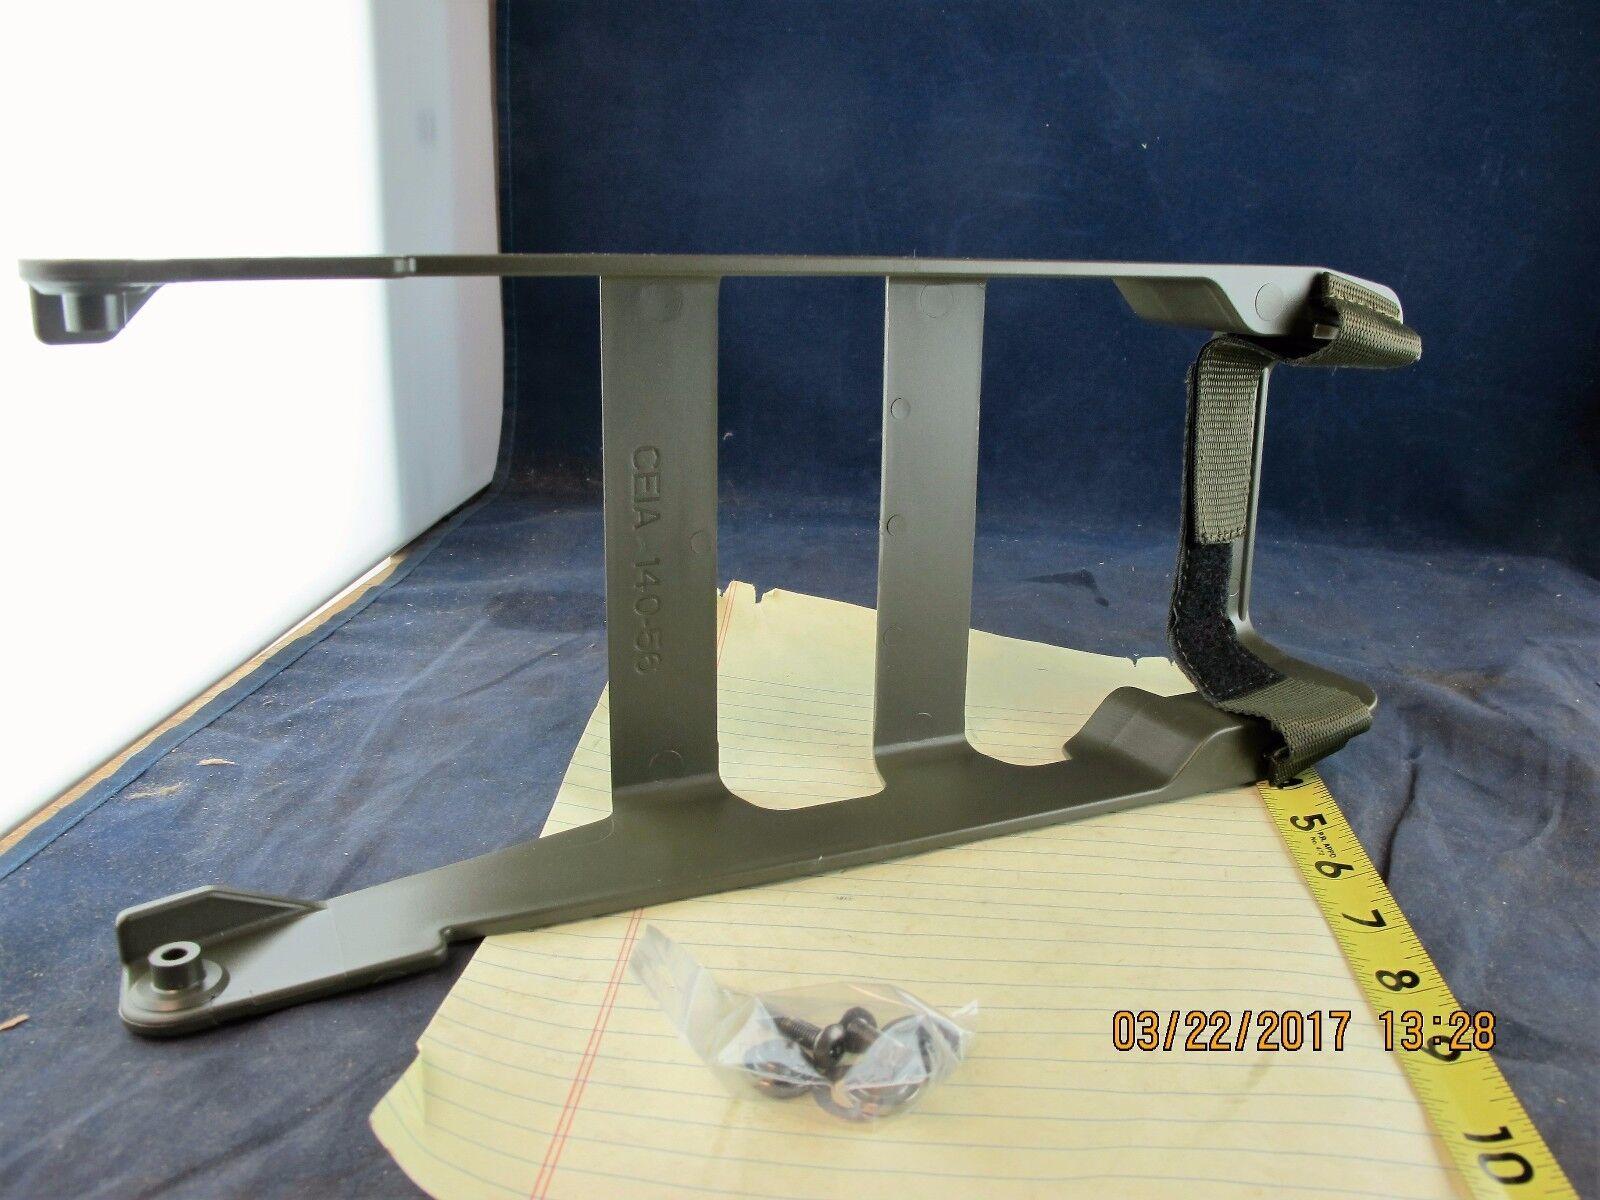 как выглядит Металлоискатель (Металлодетектор) Elbow Support CEIA CMD Compact Military Metal Detector  Military фото